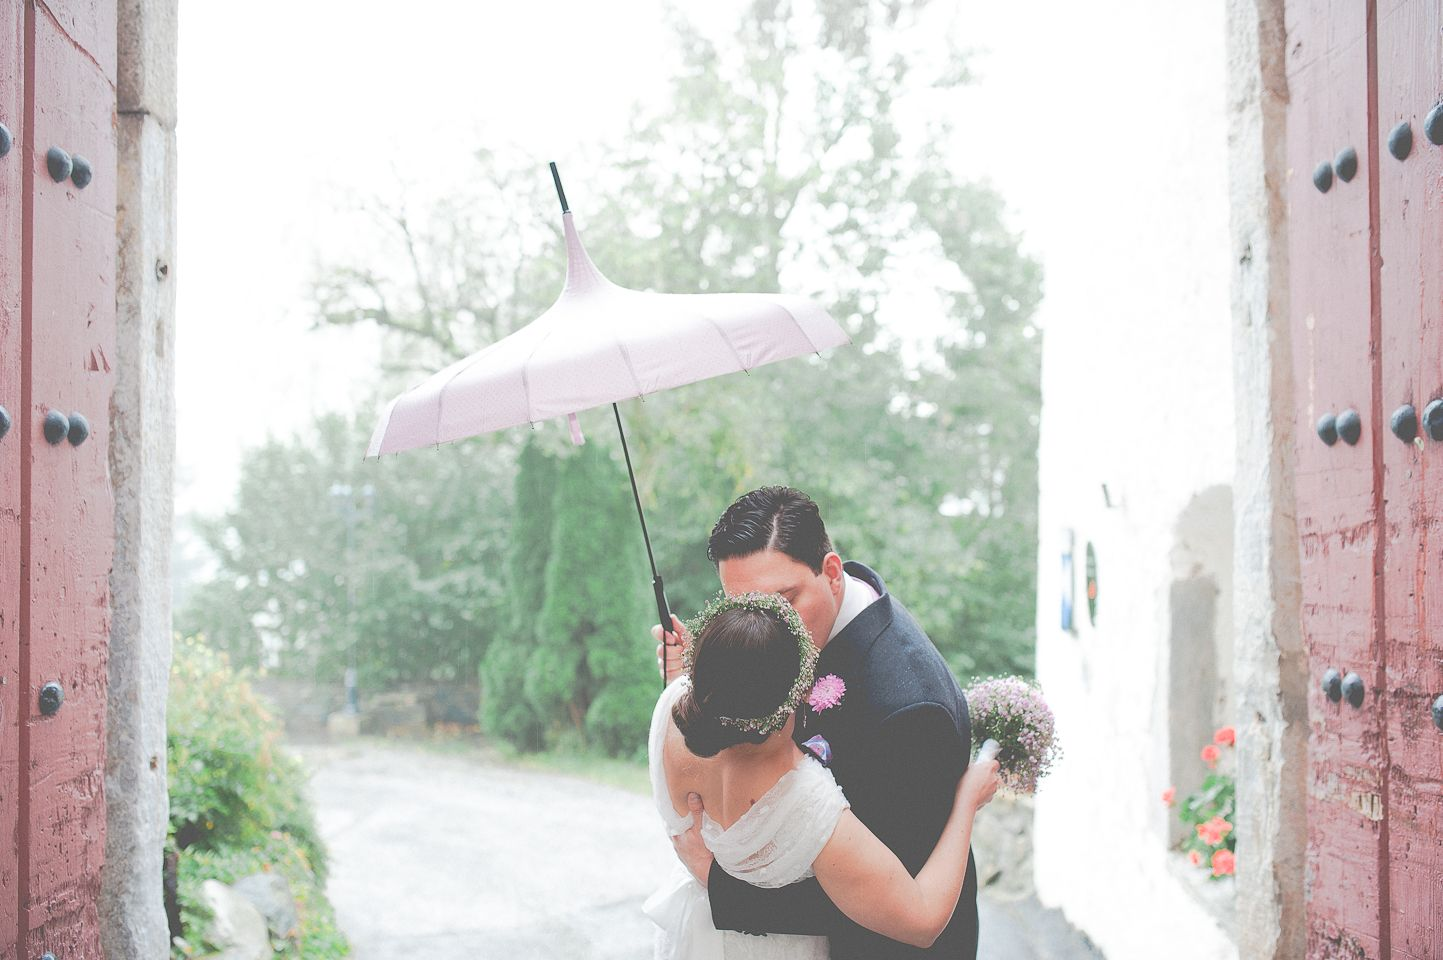 Rainy wedding day?! No problem!